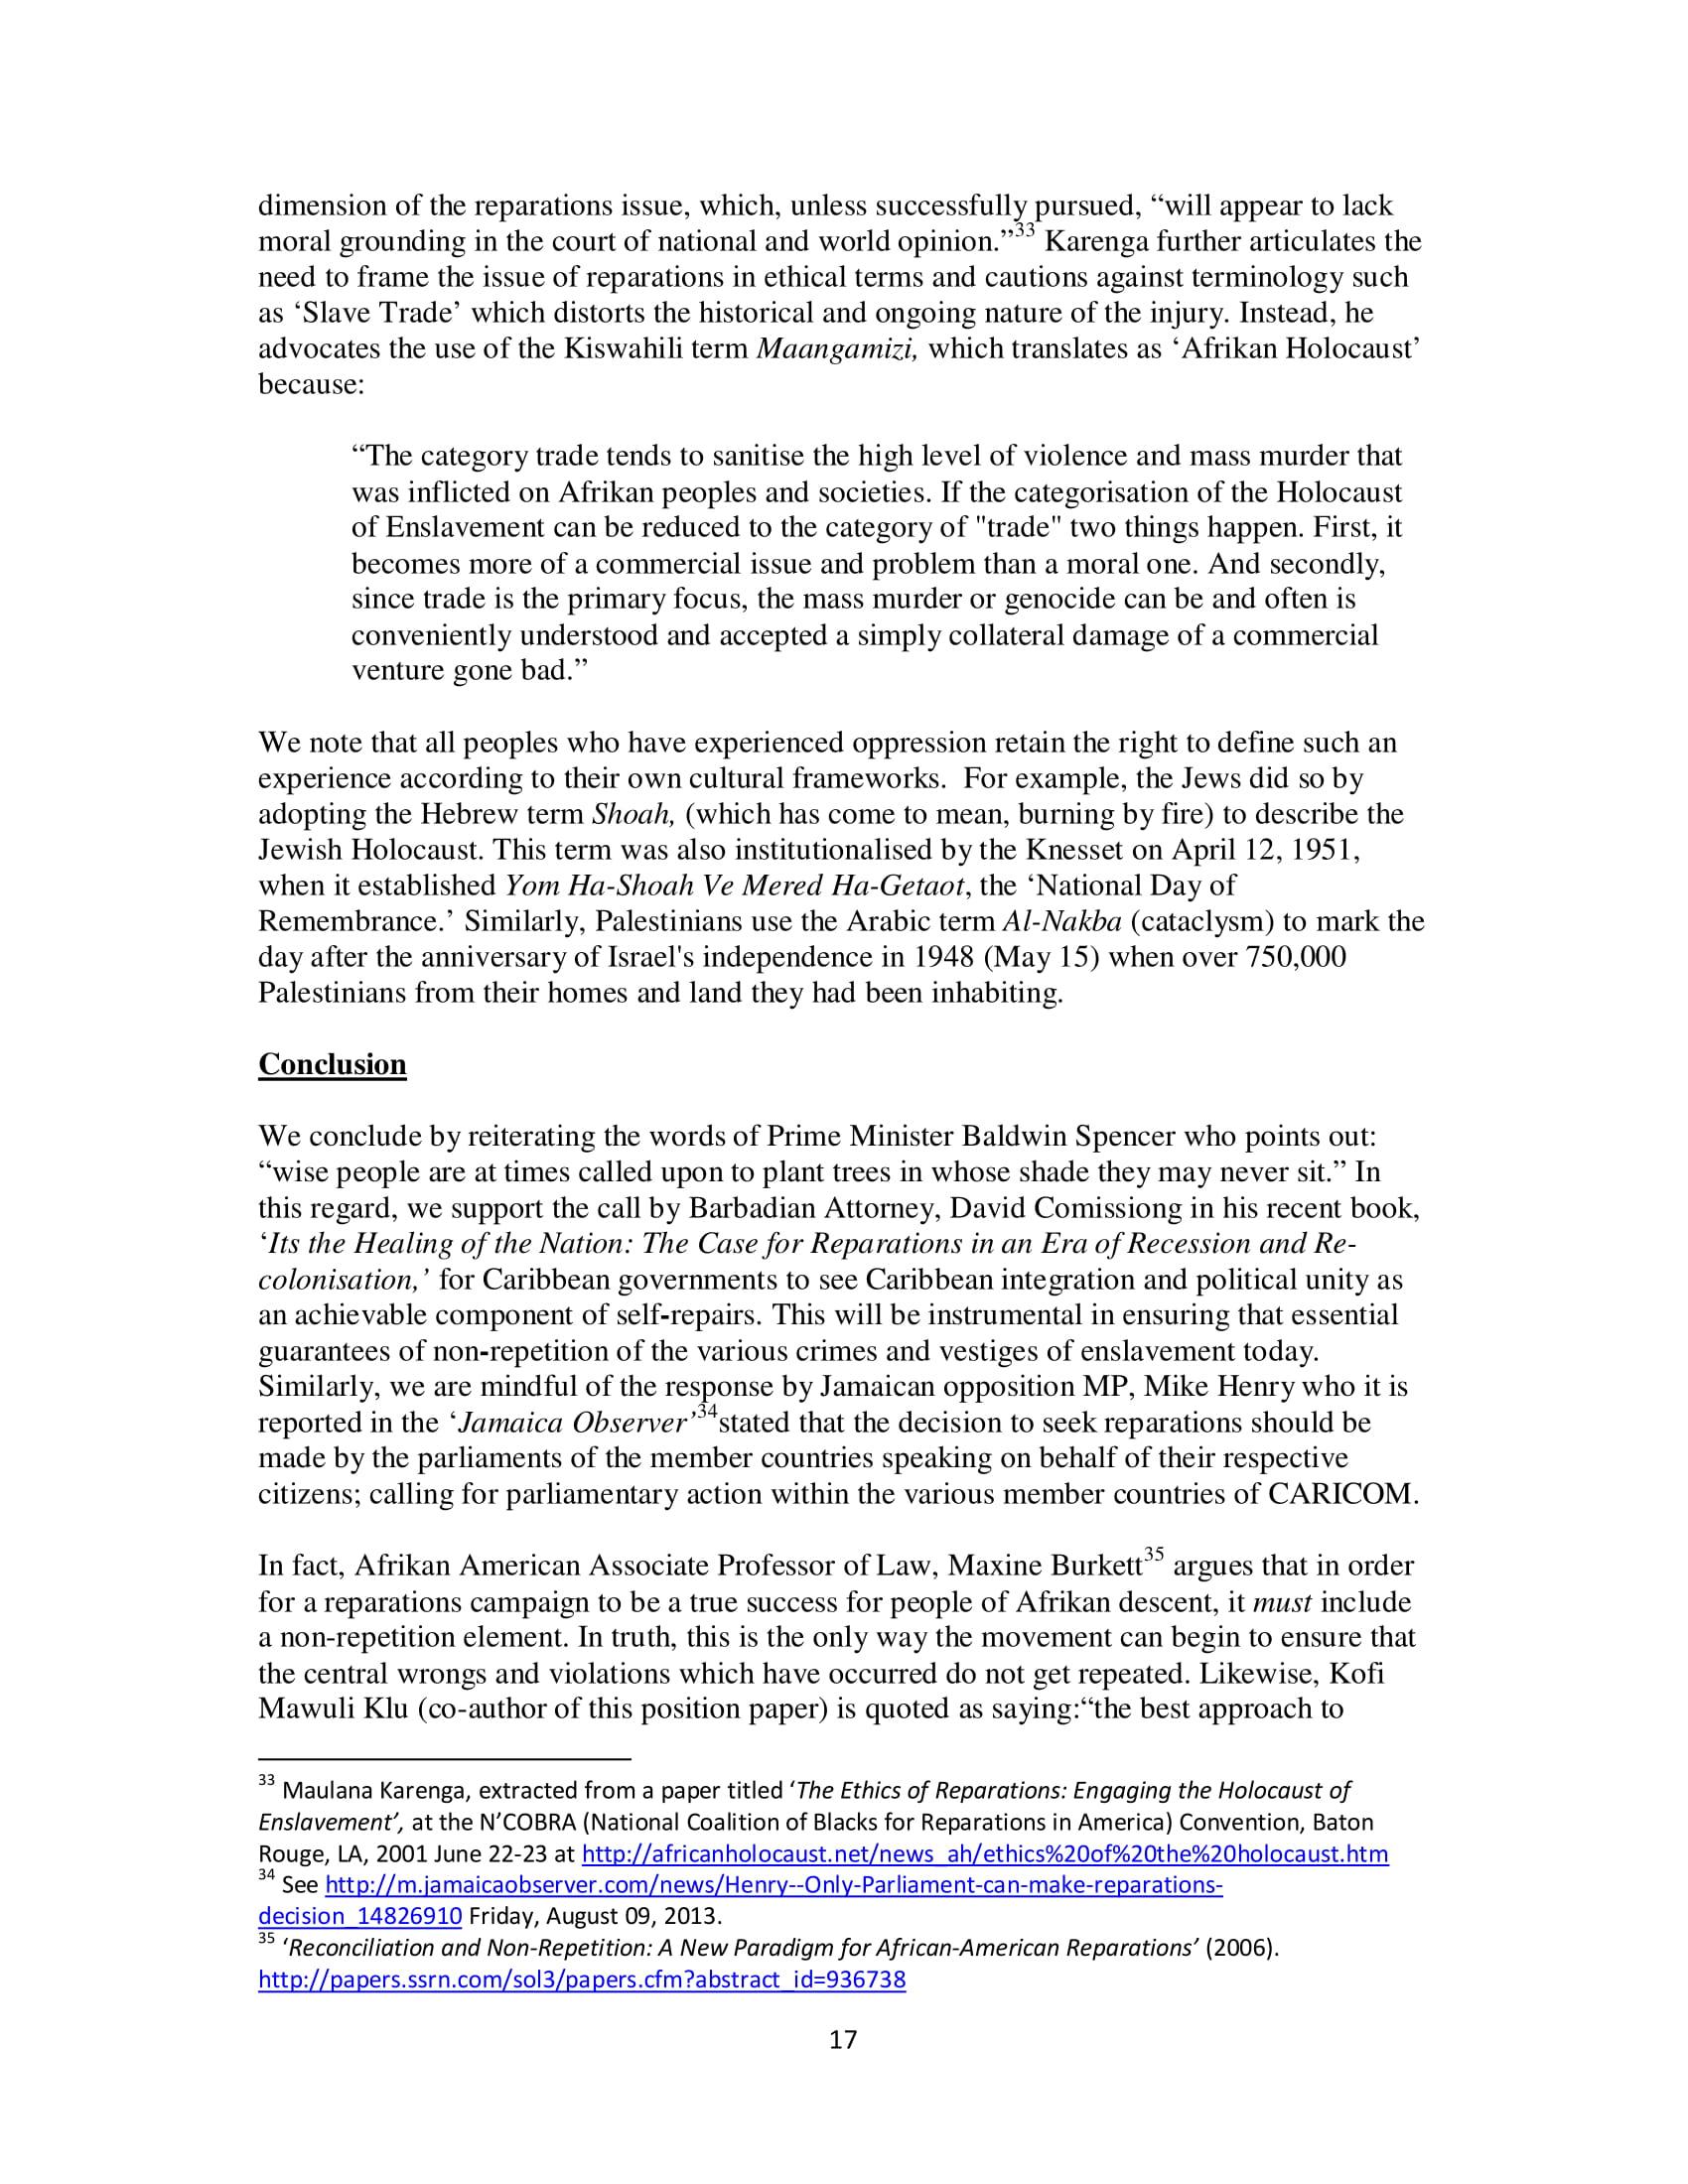 PARCOE CARICOM REPARATIONS POSITION PAPER-17